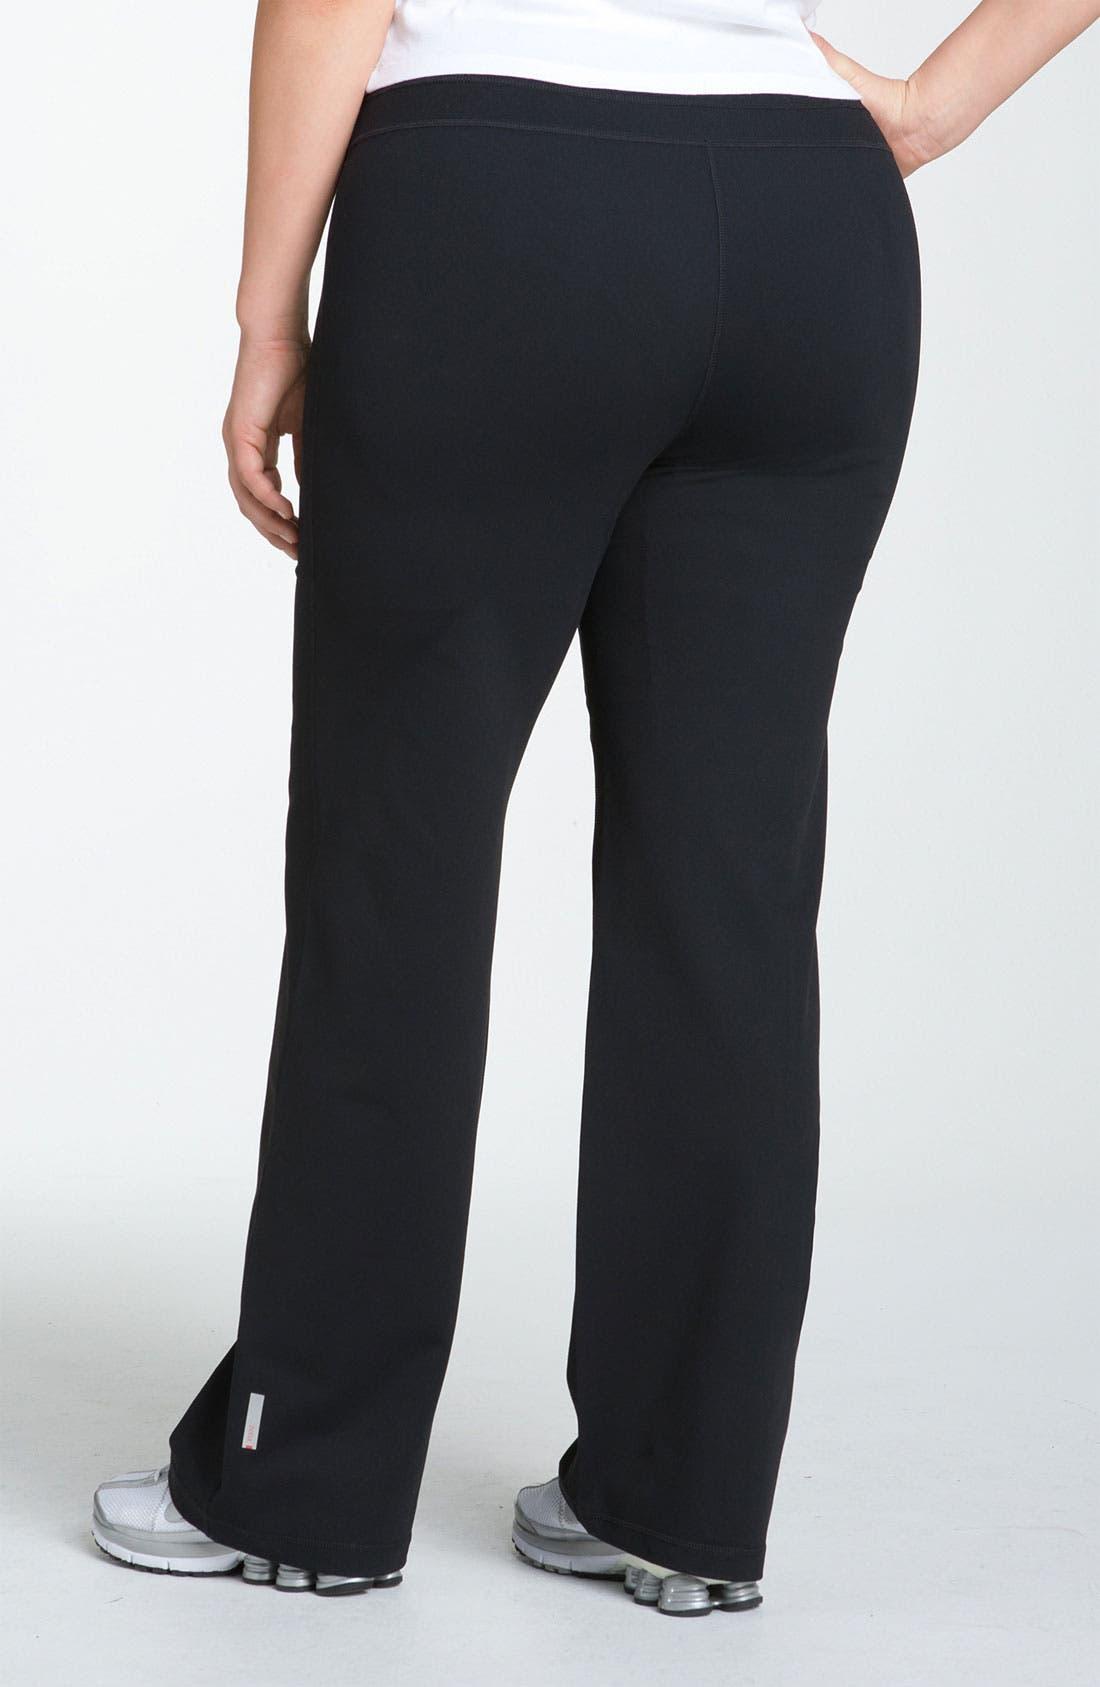 Alternate Image 2  - Zella 'Booty' Reversible Pants (Plus Size)